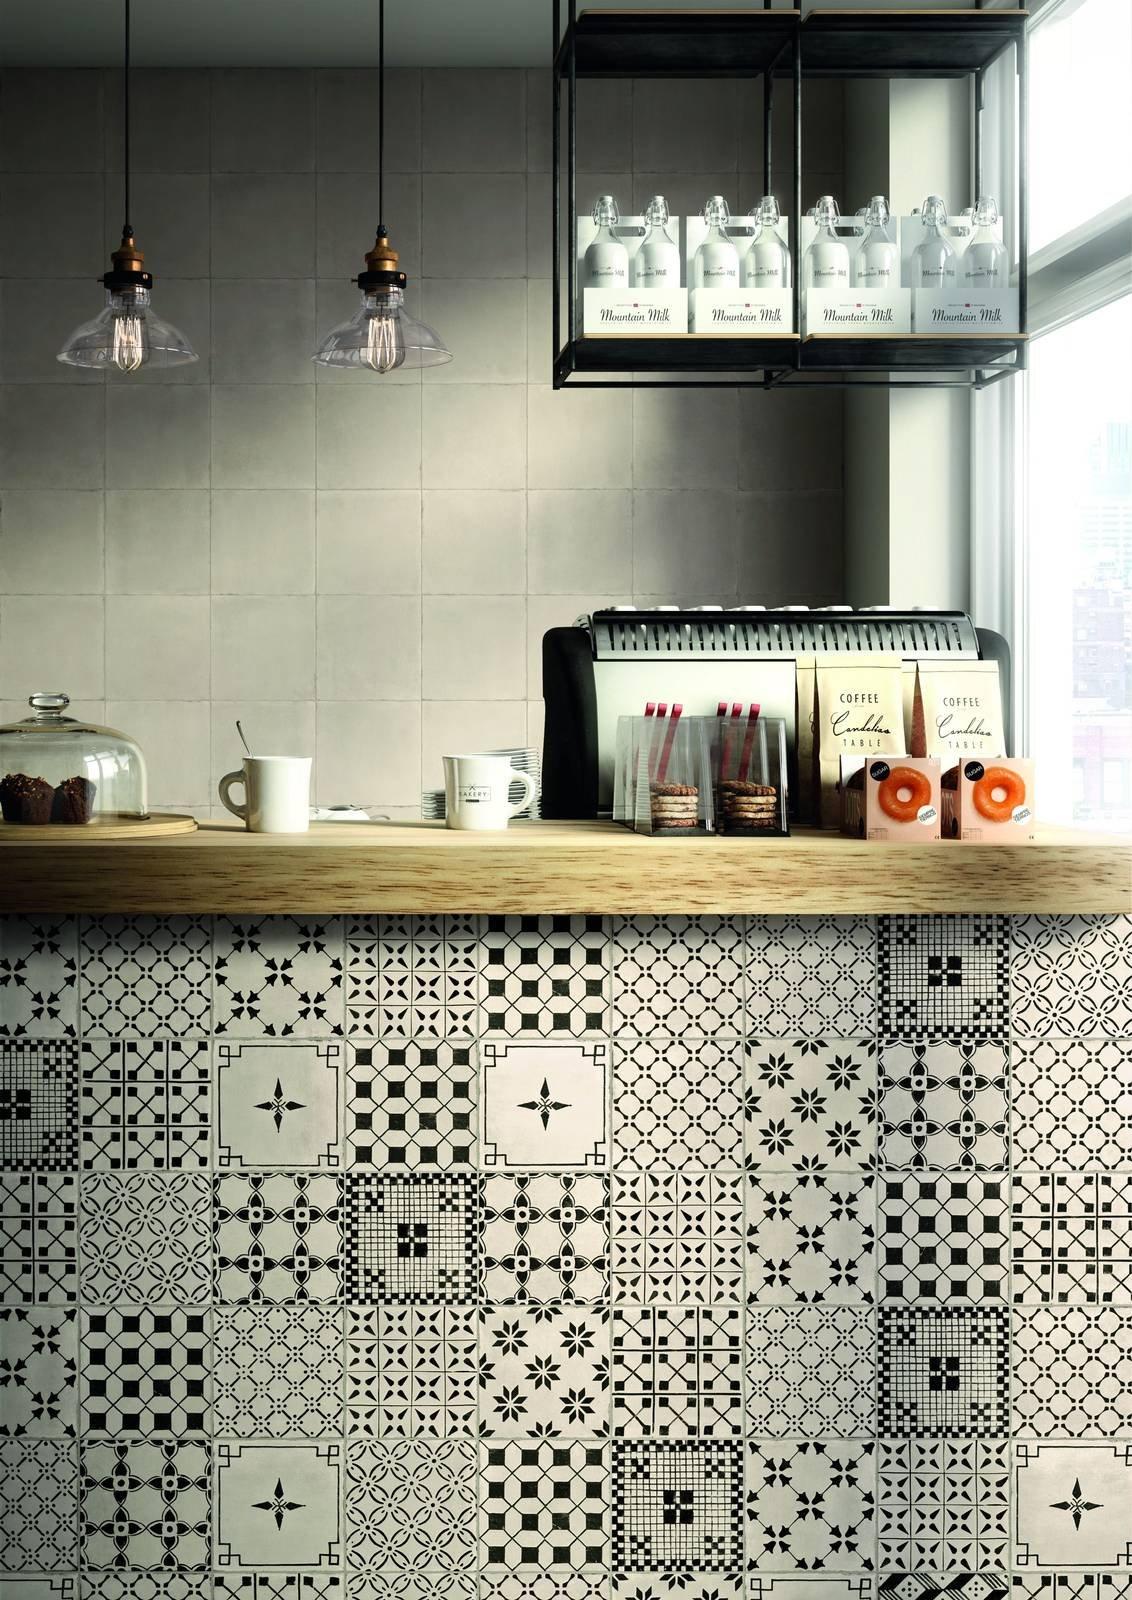 Piastrelle cucina a pavimento o parete anche multicolor for Piastrelle mosaico per cucina